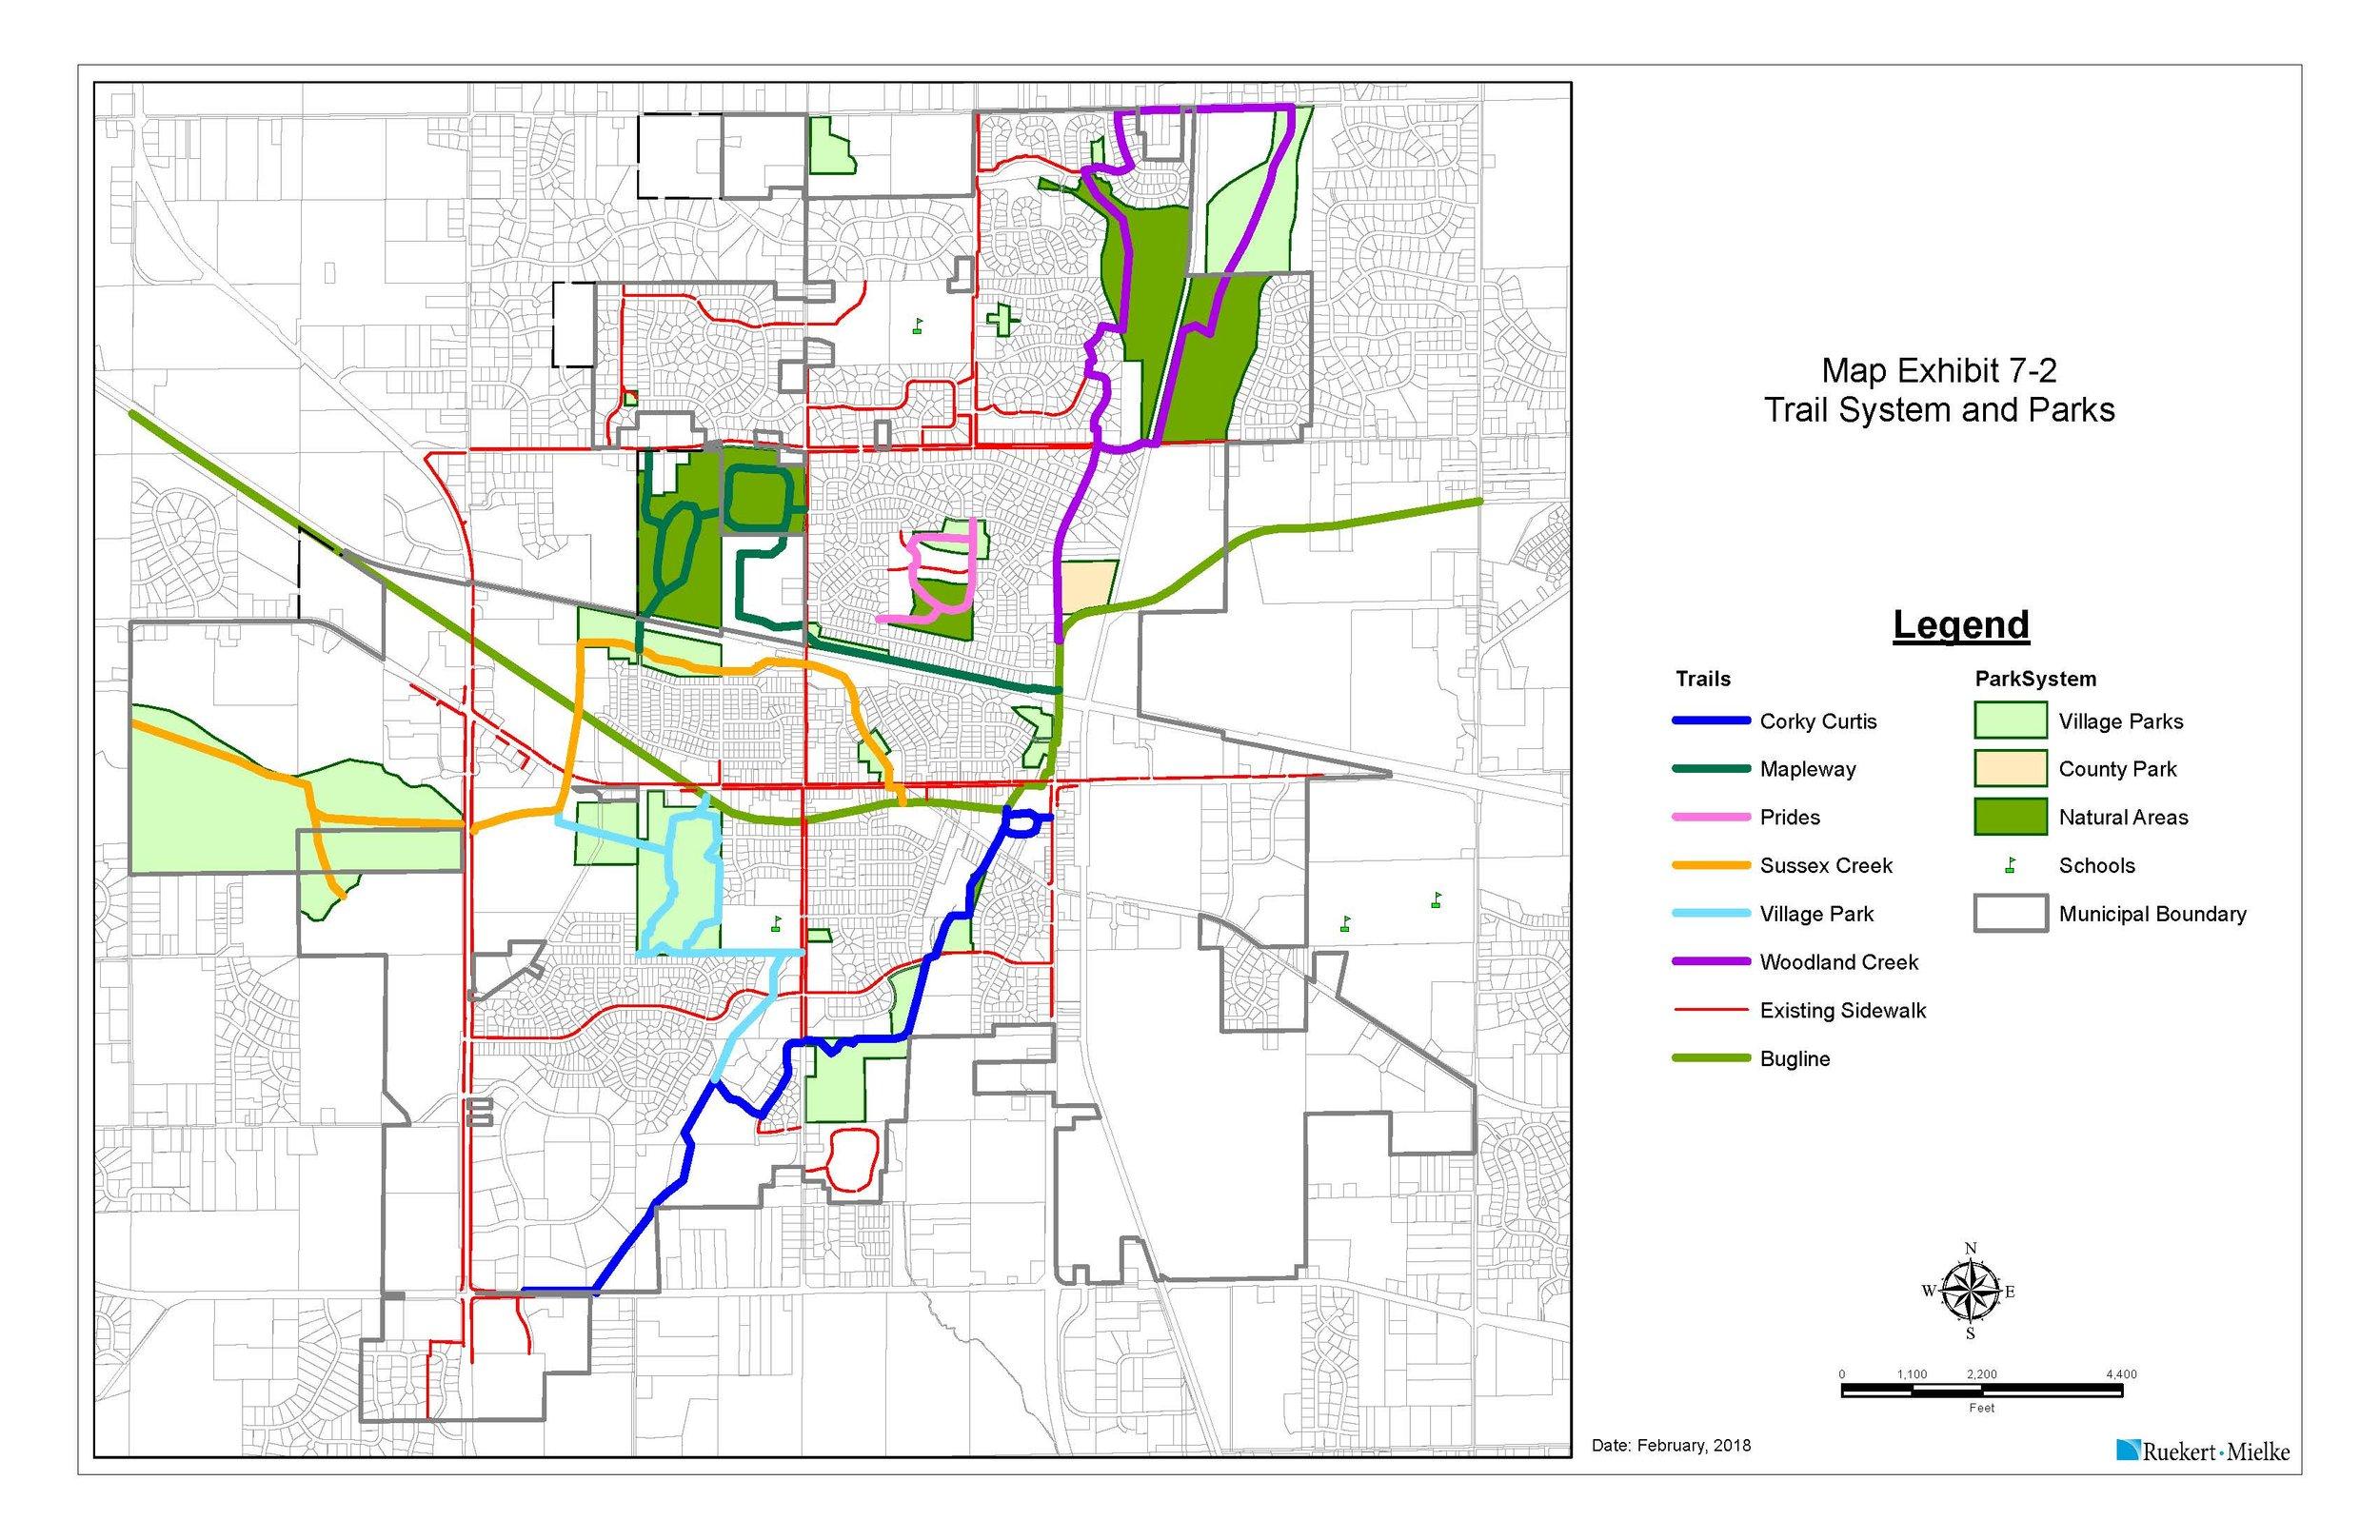 Trail & Park Map